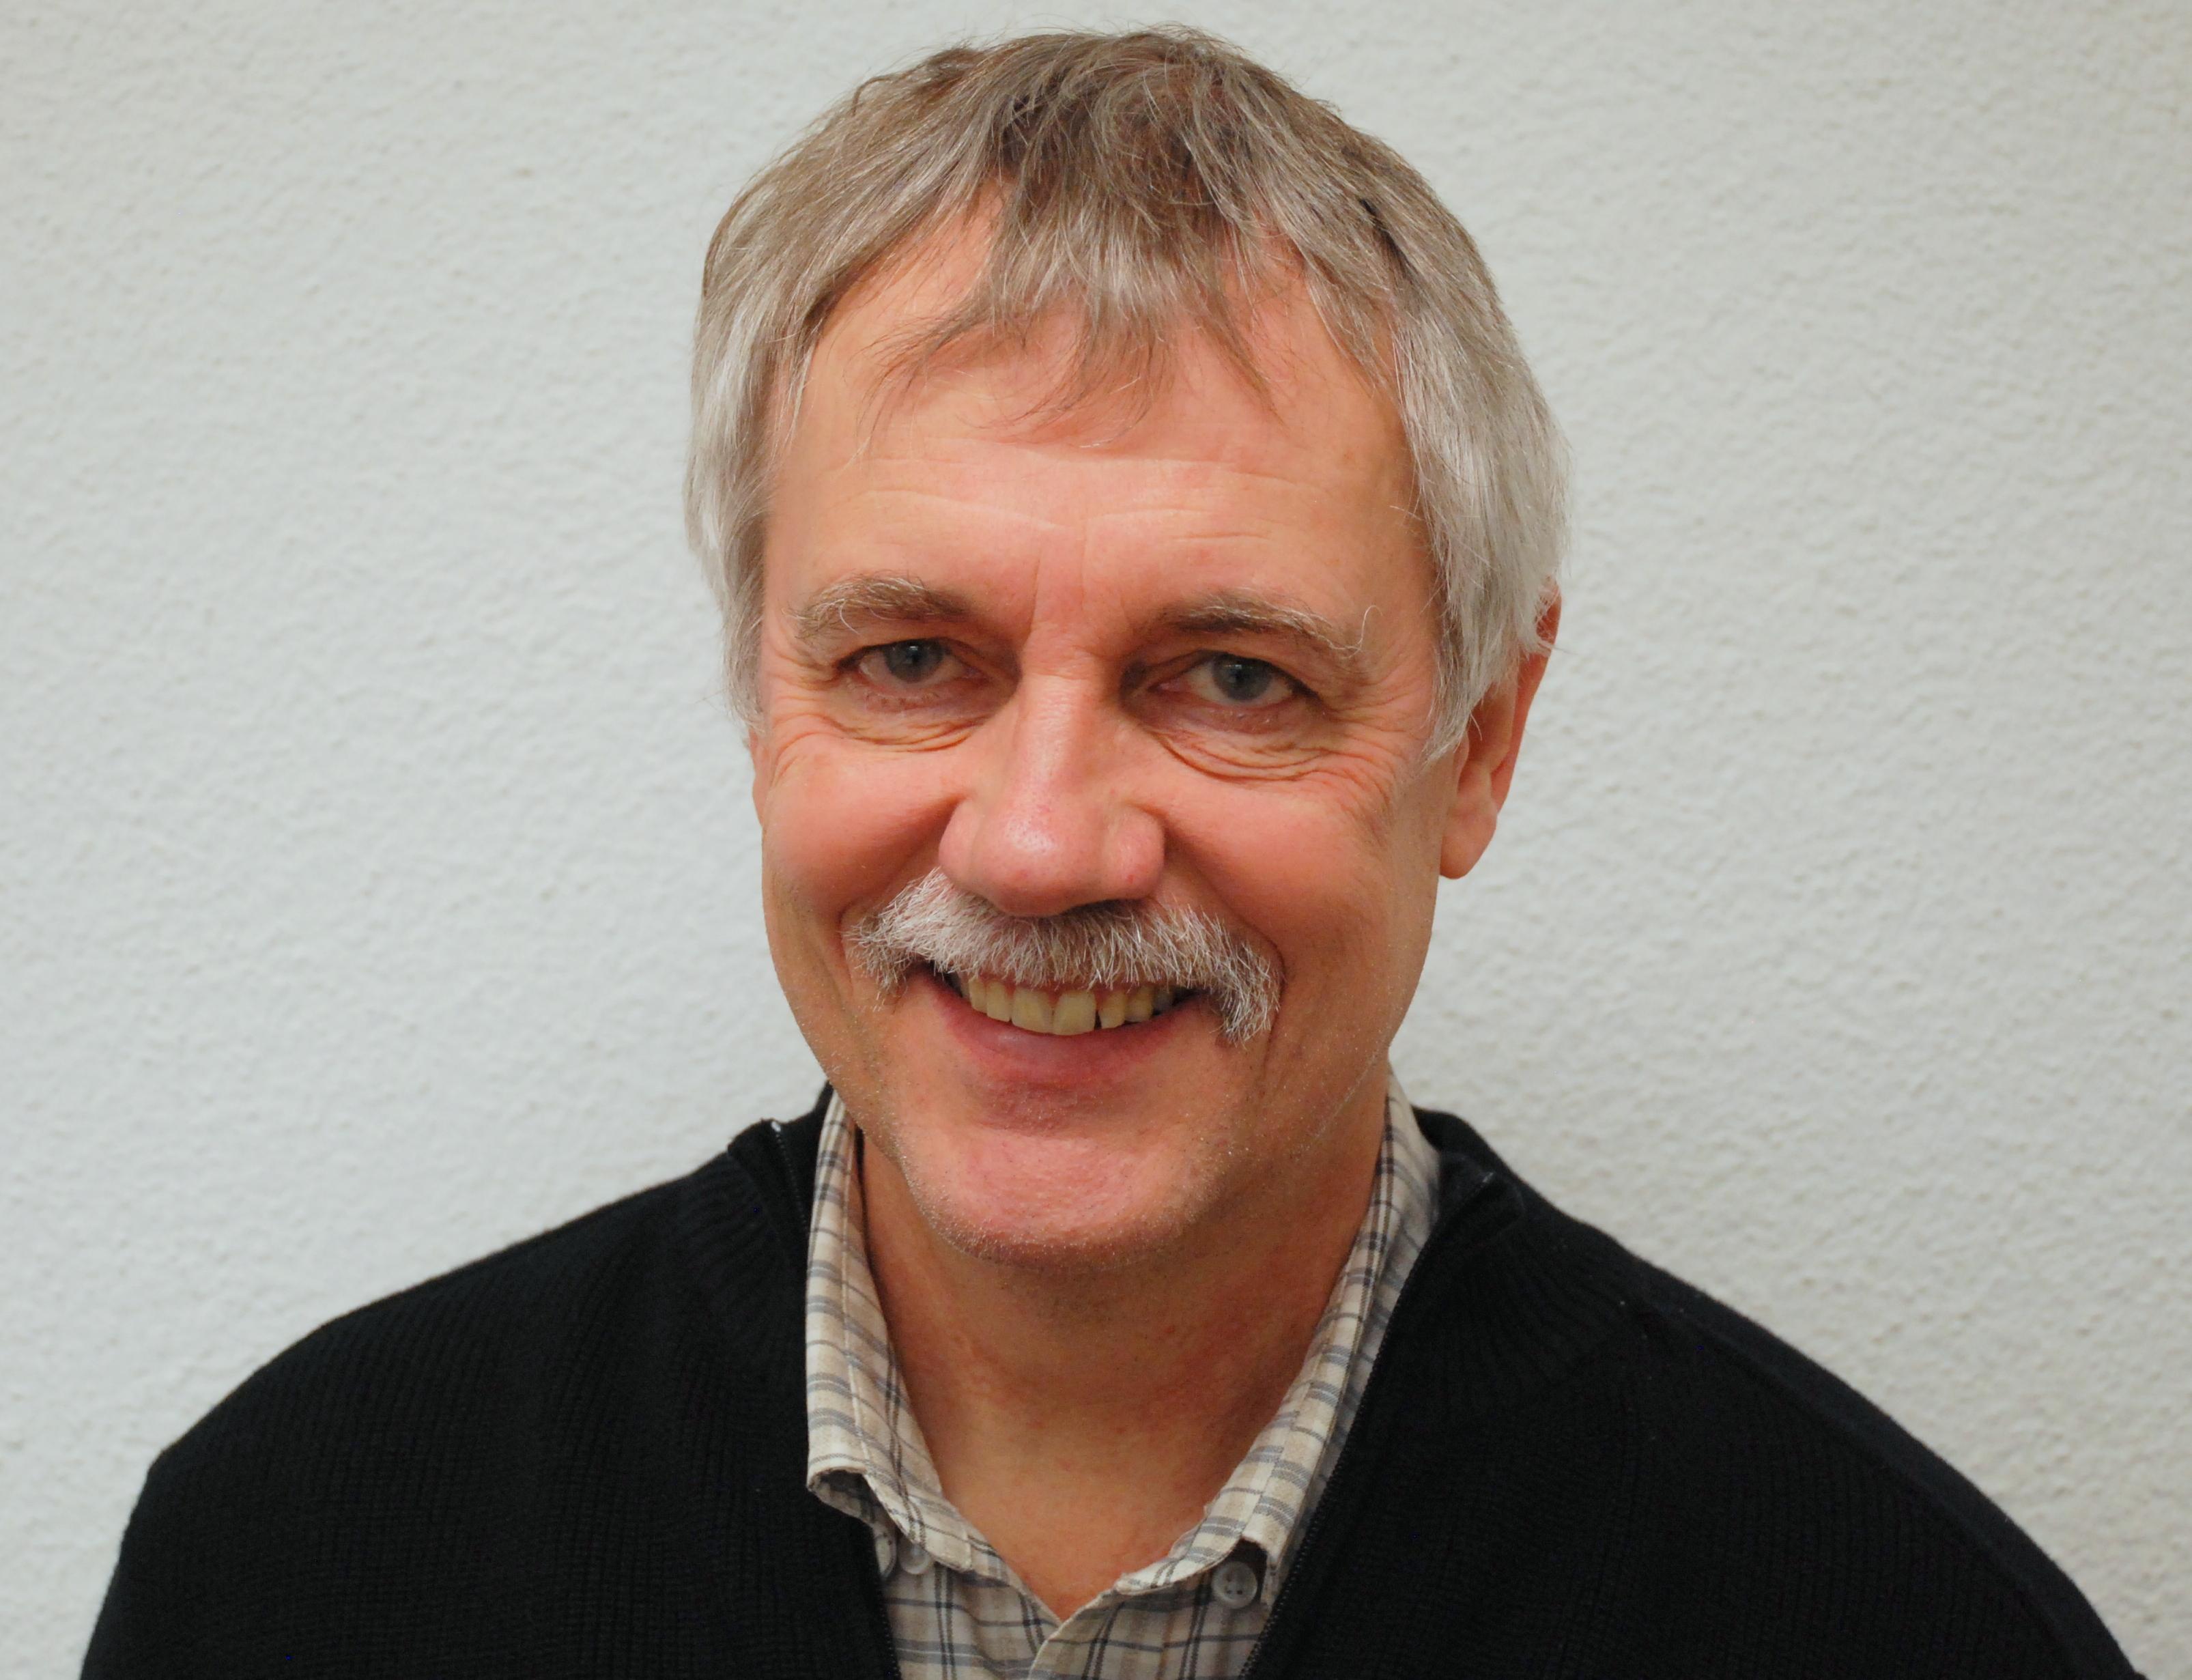 image of Ruedi Aebersold